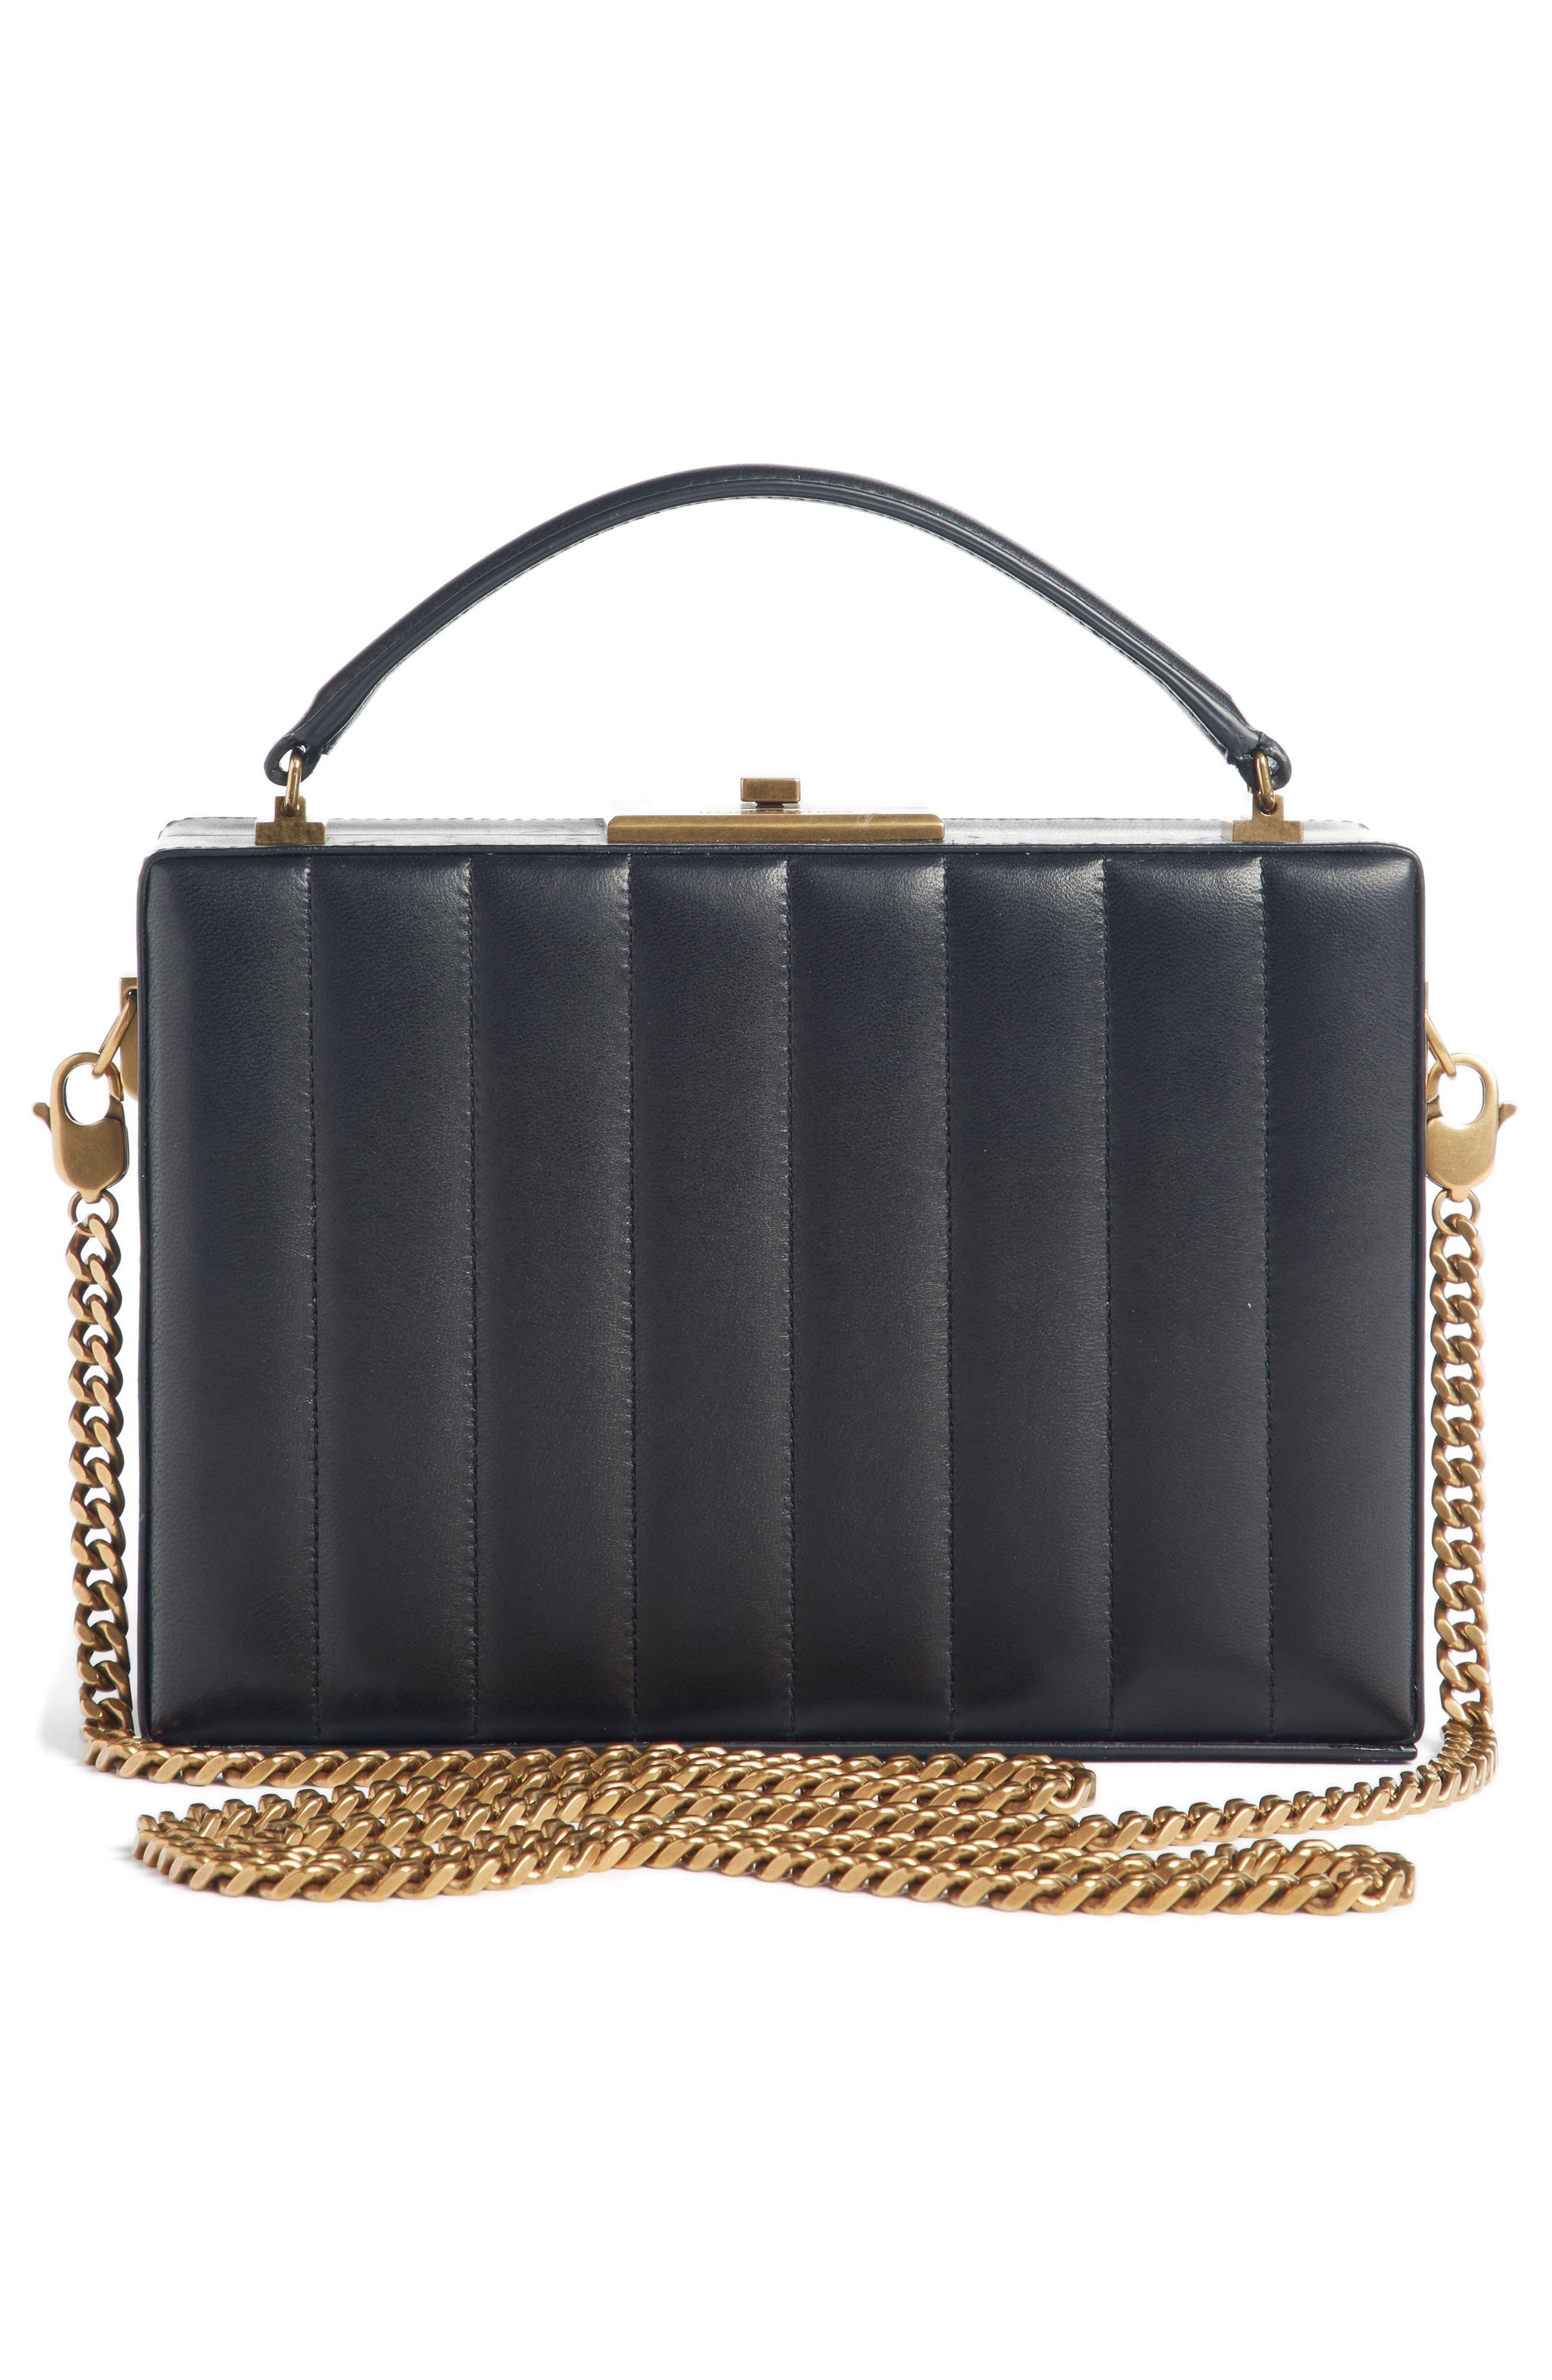 Nan Quilted Leather Frame Bag,                             Alternate thumbnail 2, color,                             NOIR